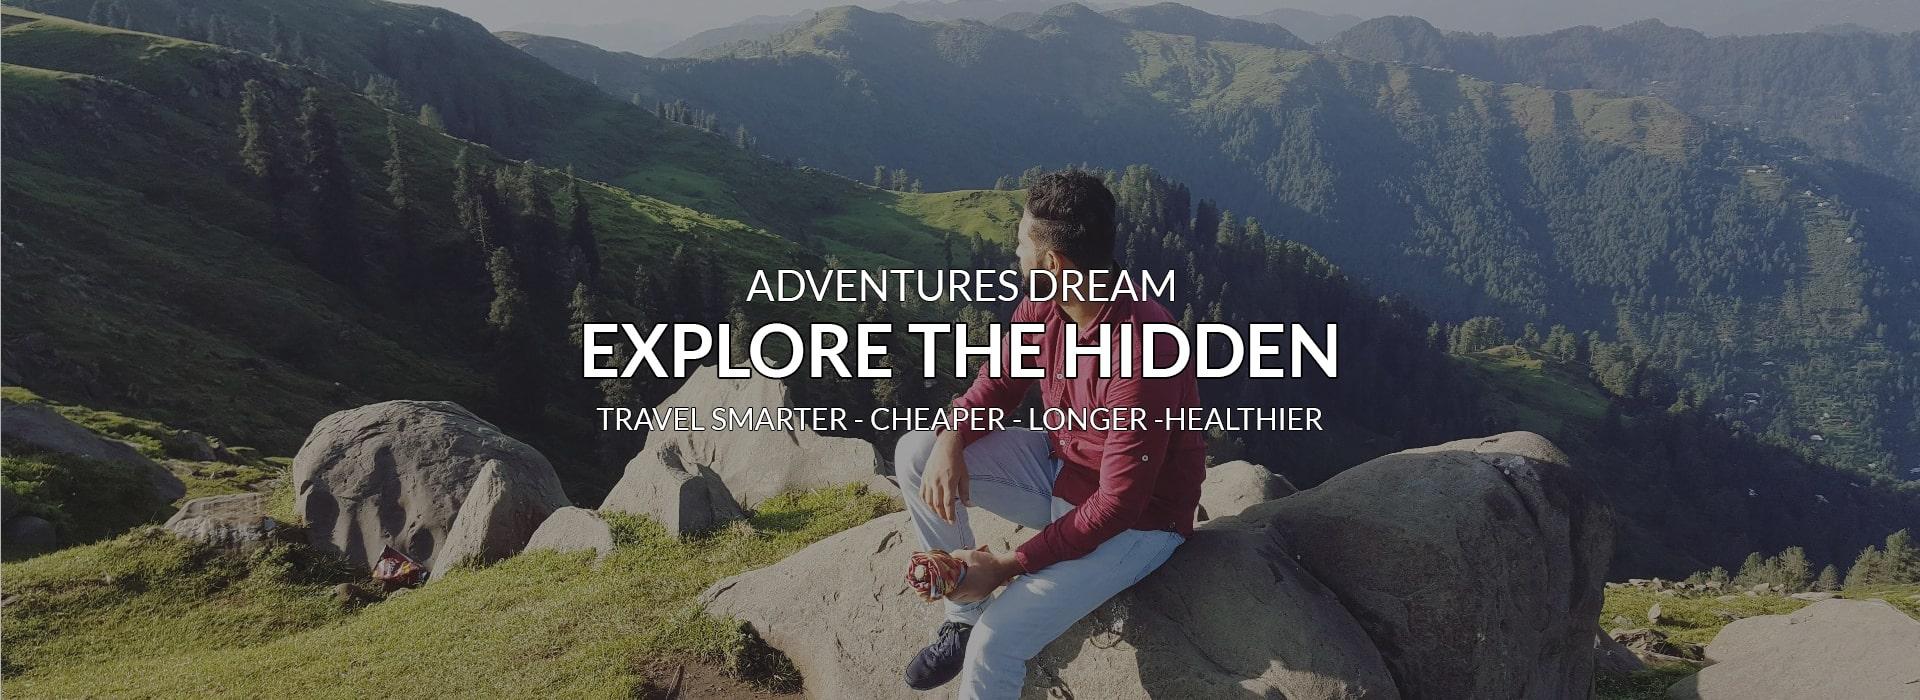 Adventures Dream - Best travel siteAdventures Dream - Best travel site